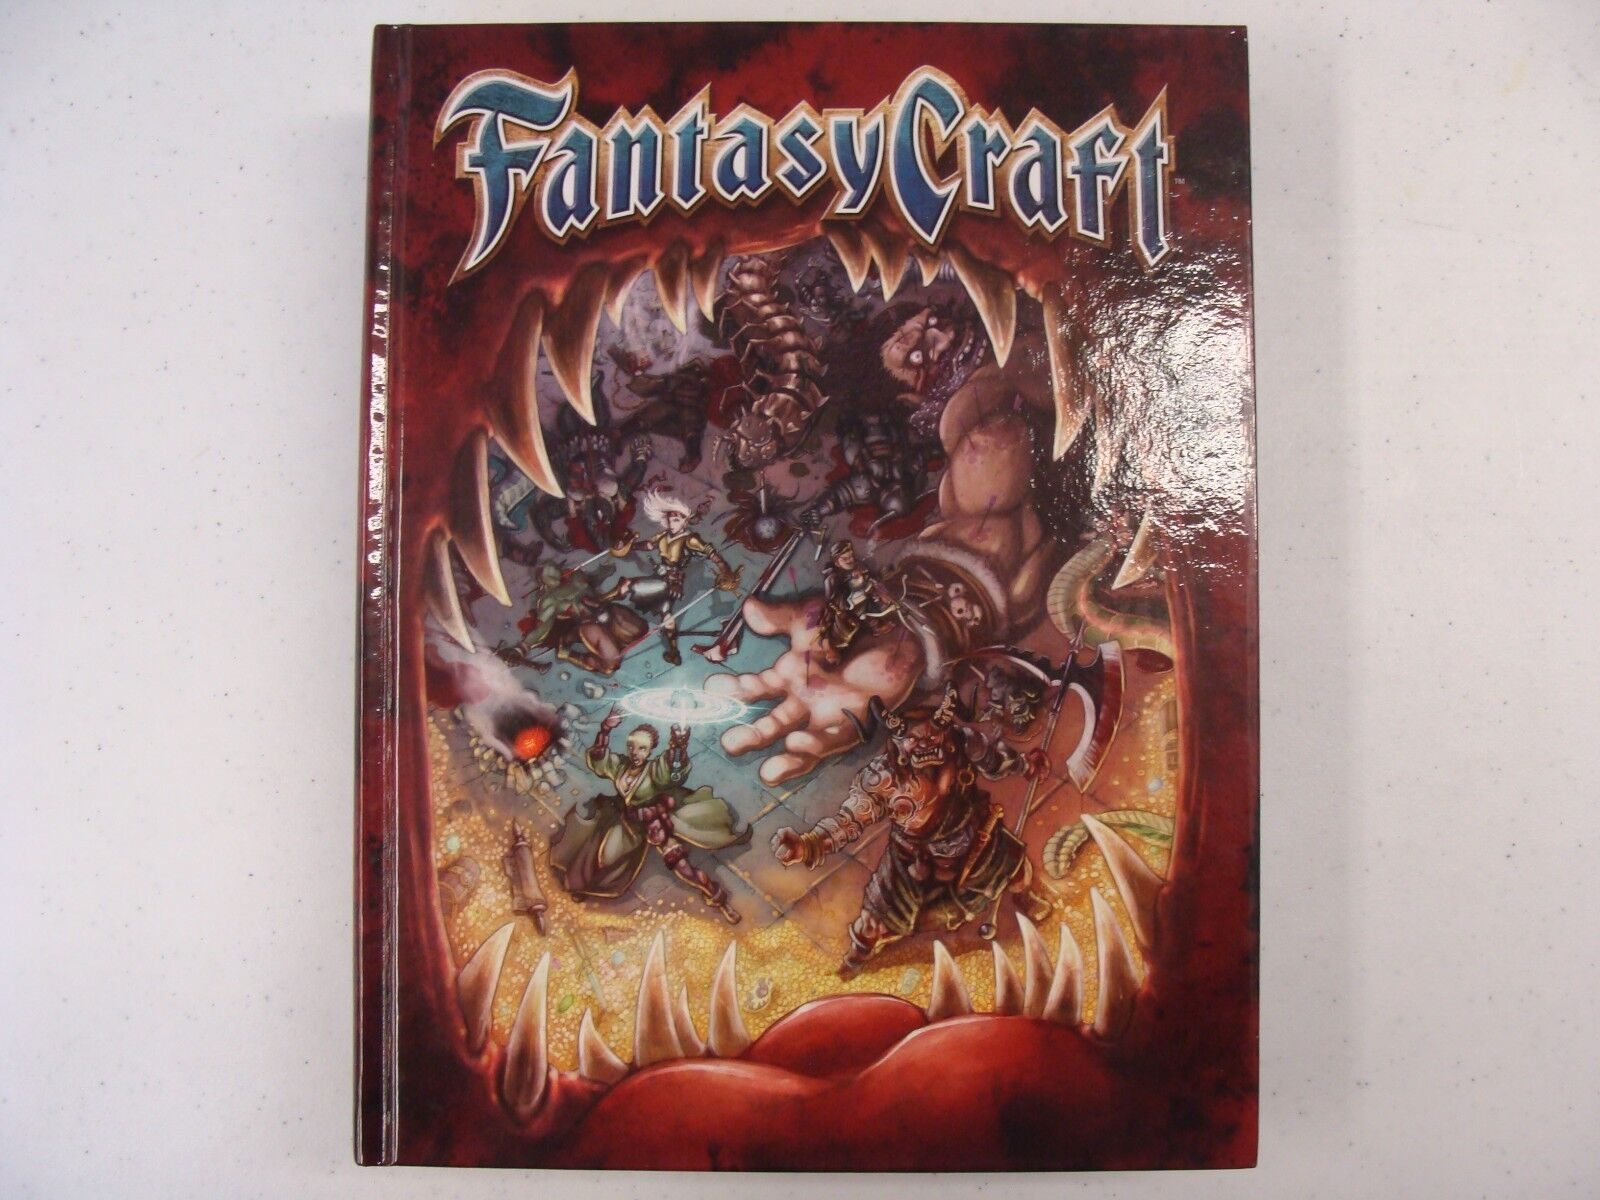 Fantasy Craft  Core Rulebook  Hard Cover  Crafty  Master Craft